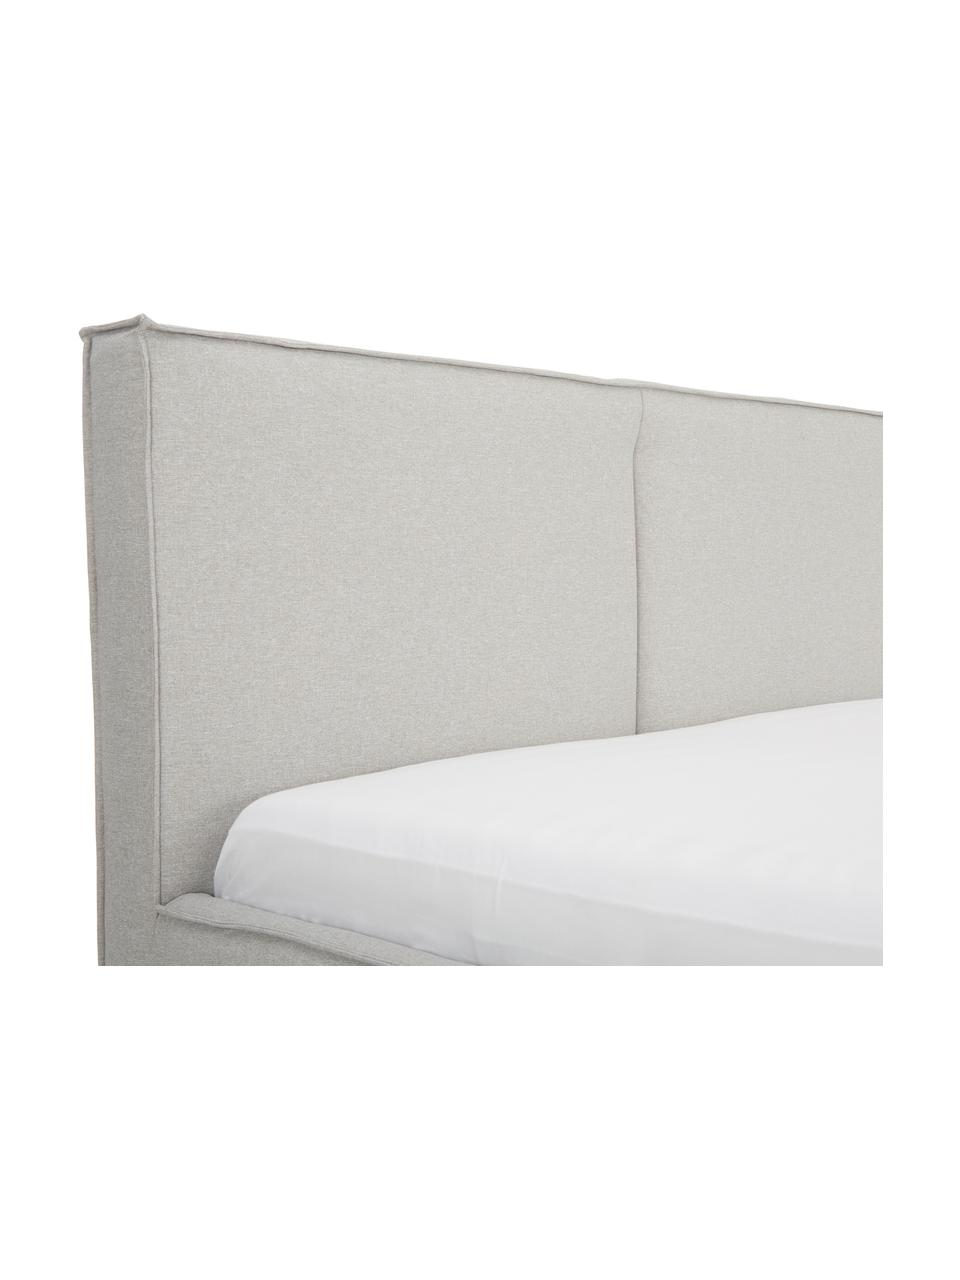 Gestoffeerd bed Dream met opbergruimte, Frame: massief grenenhout, Bekleding: polyester (structuurmater, Mauve, Verschillende formaten